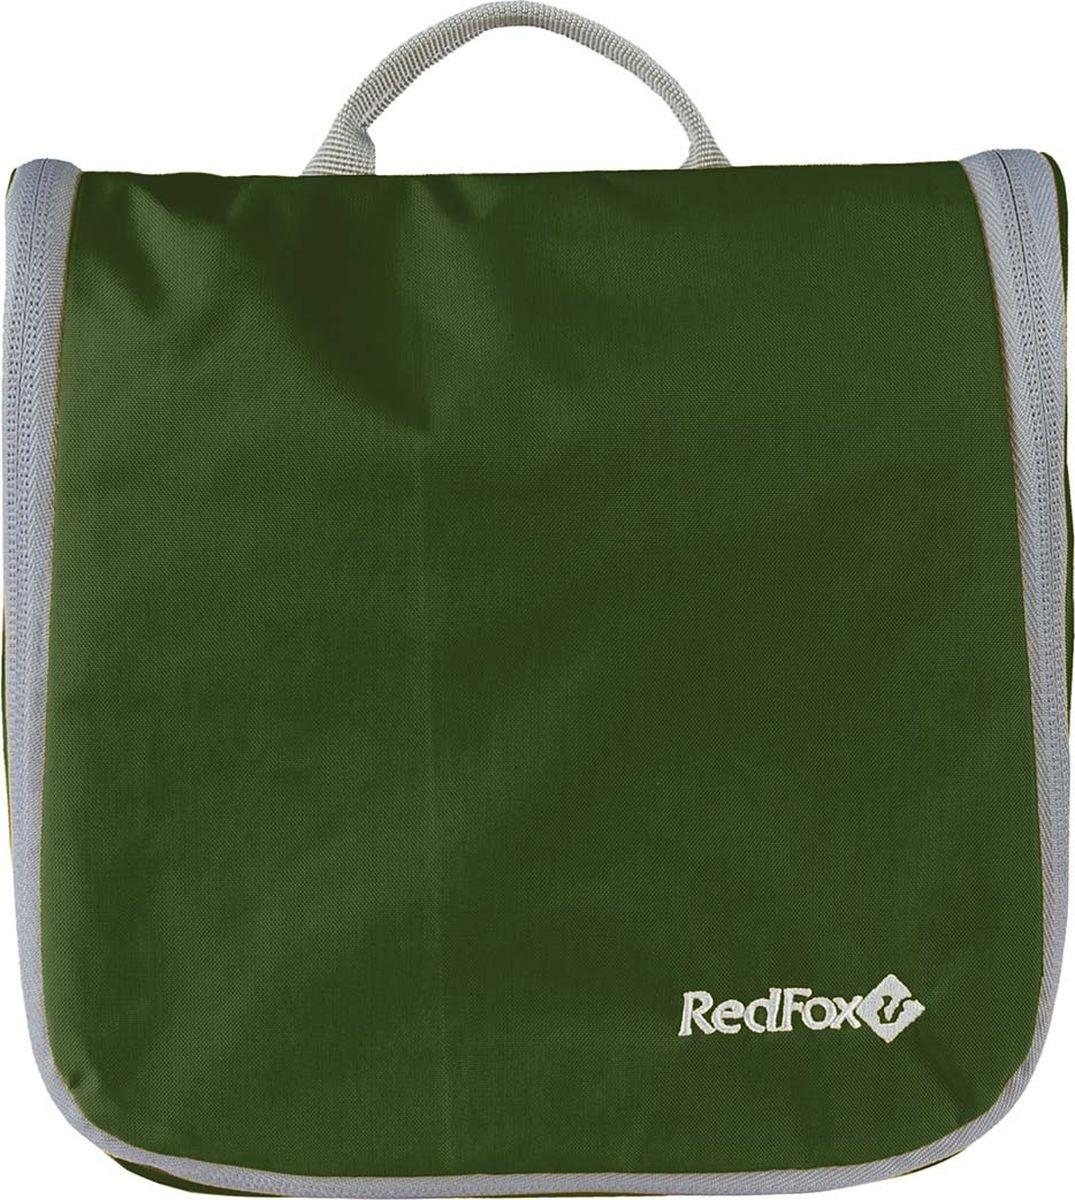 цены на Сумка дорожная Red Fox Voyager L, 1046752, темно-зеленый, 44 х 20 х 8 см  в интернет-магазинах